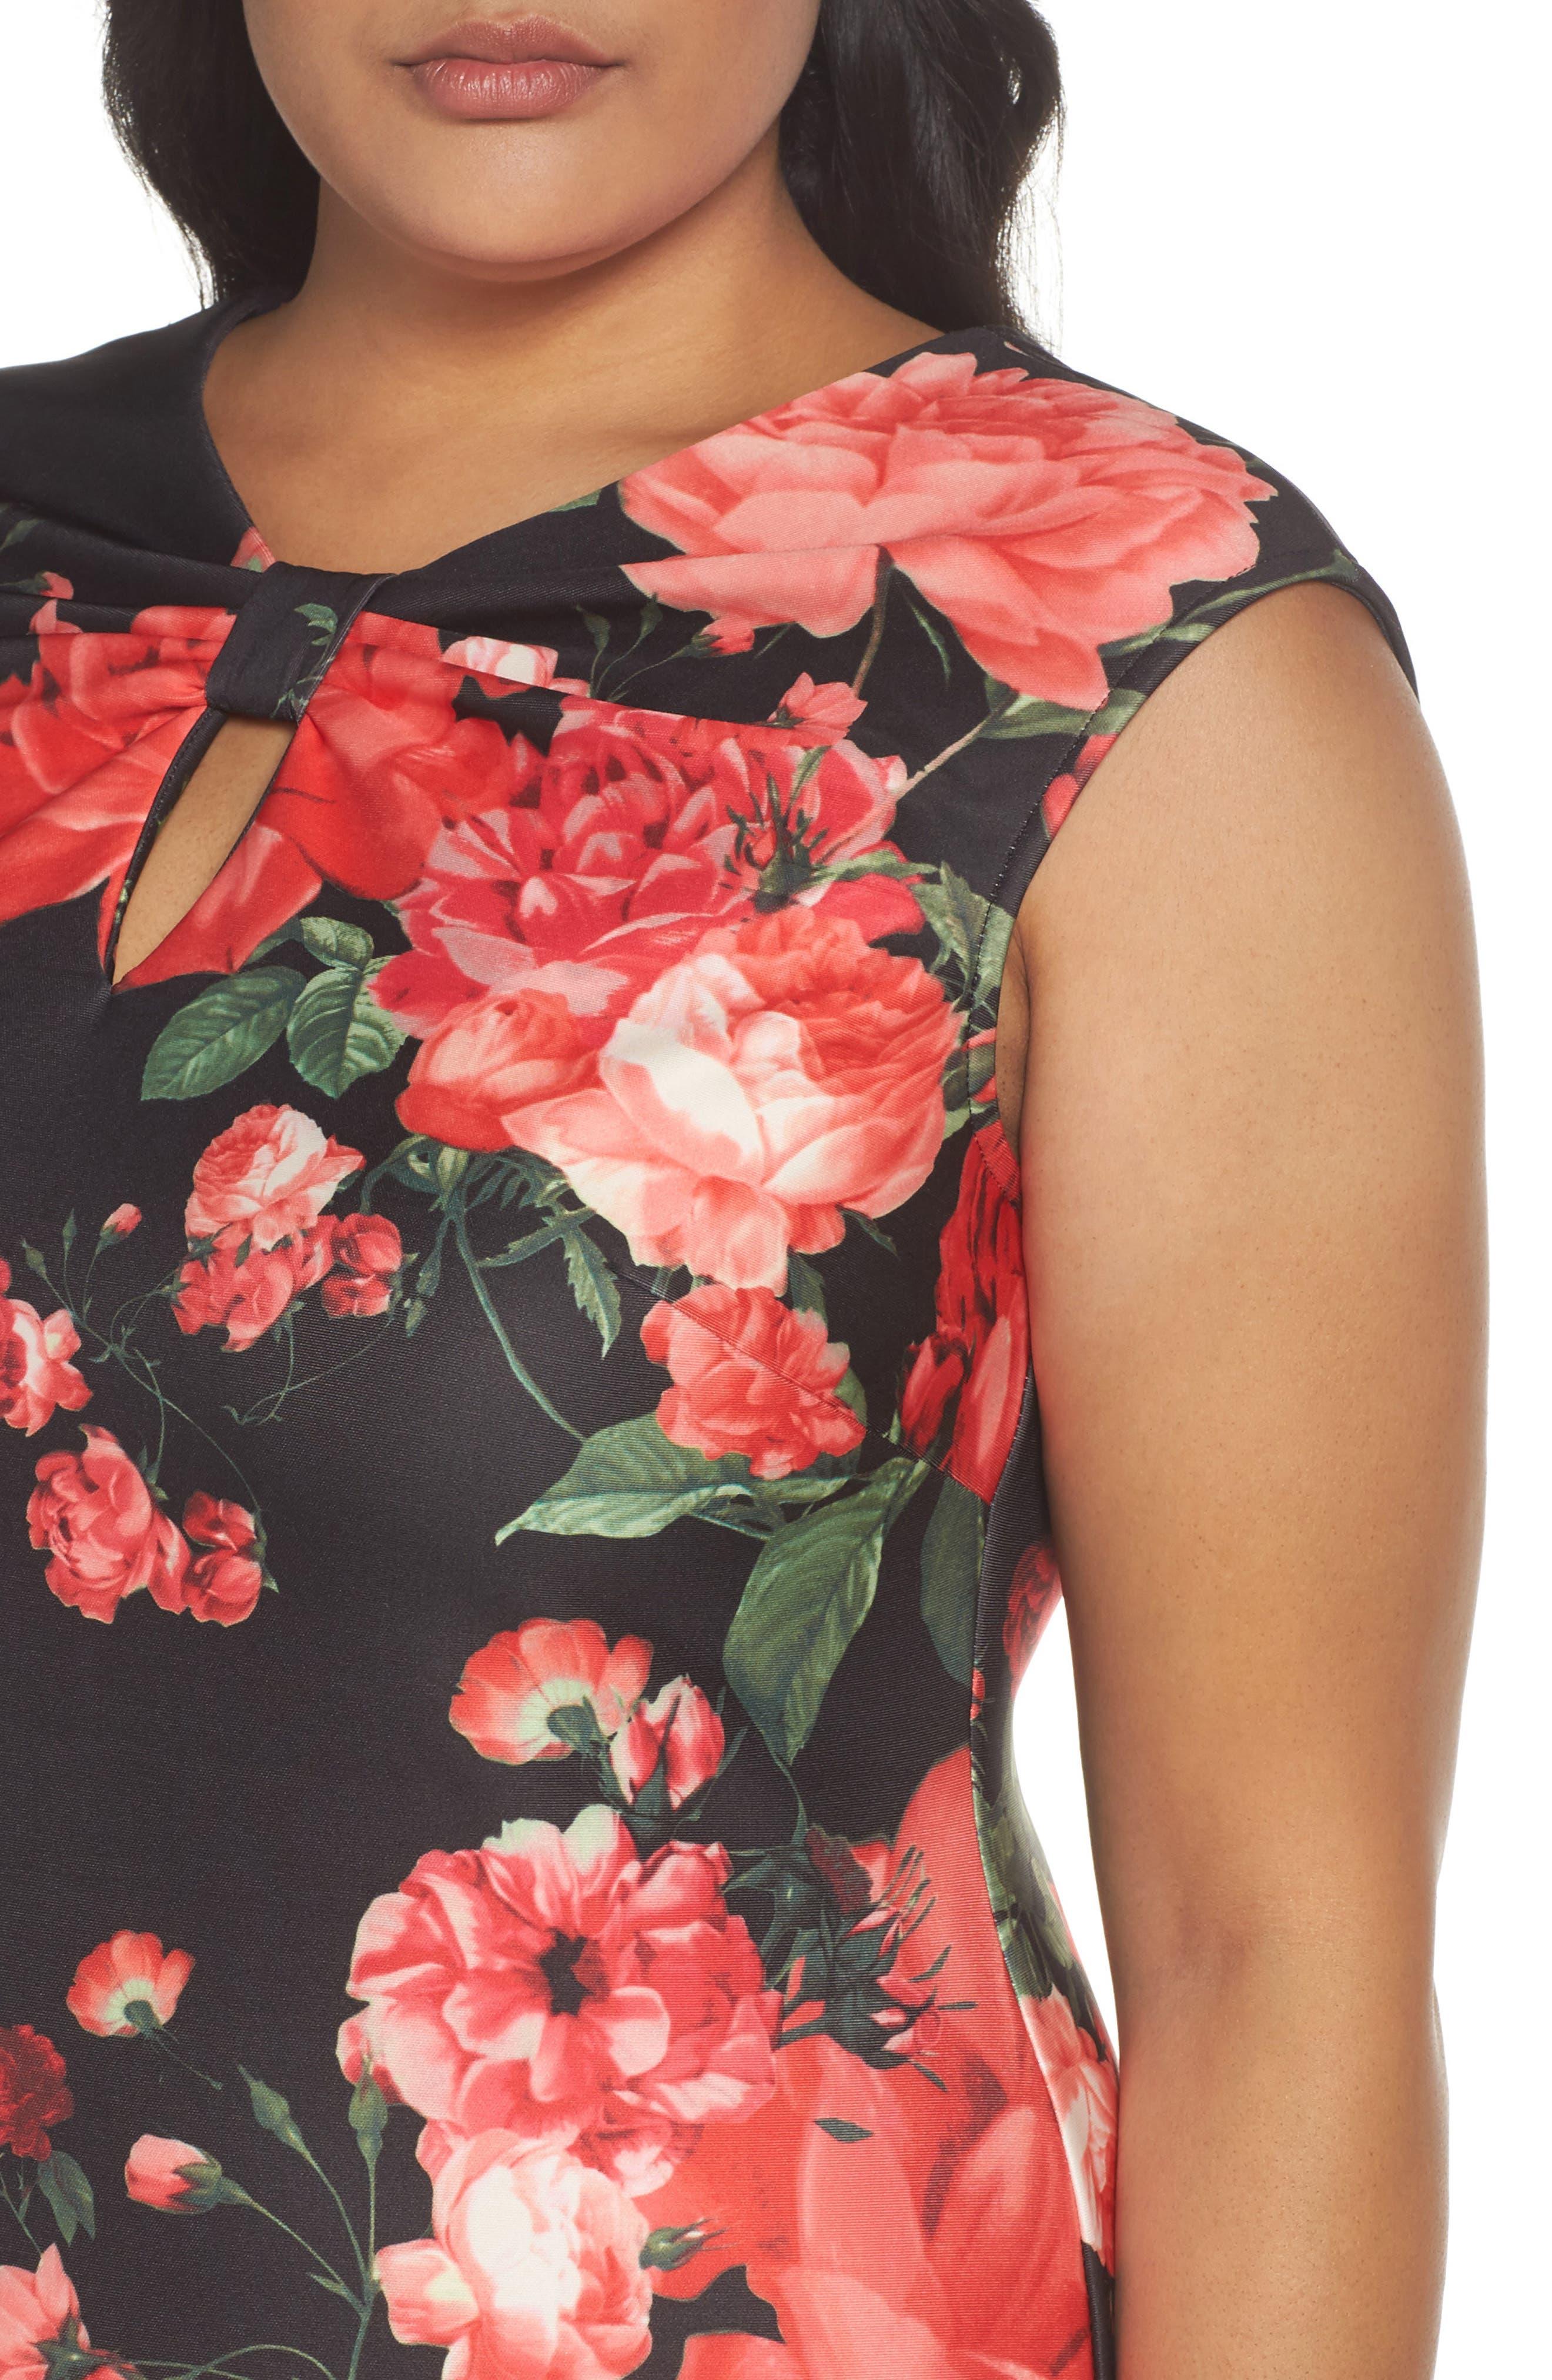 Floral Print Sheath Dress,                             Alternate thumbnail 4, color,                             Black/ Red